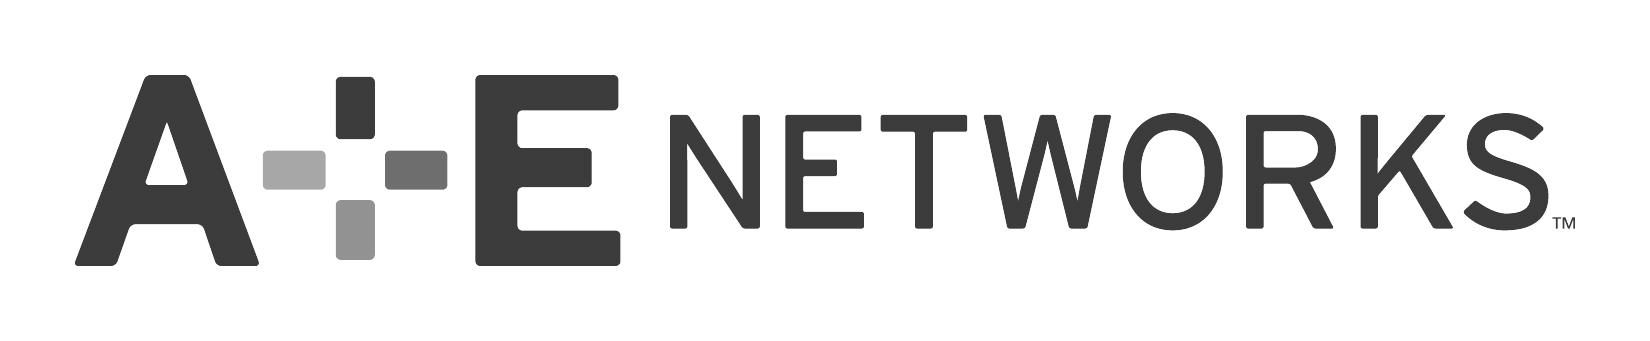 AE_Networks_FIN_BW.jpg